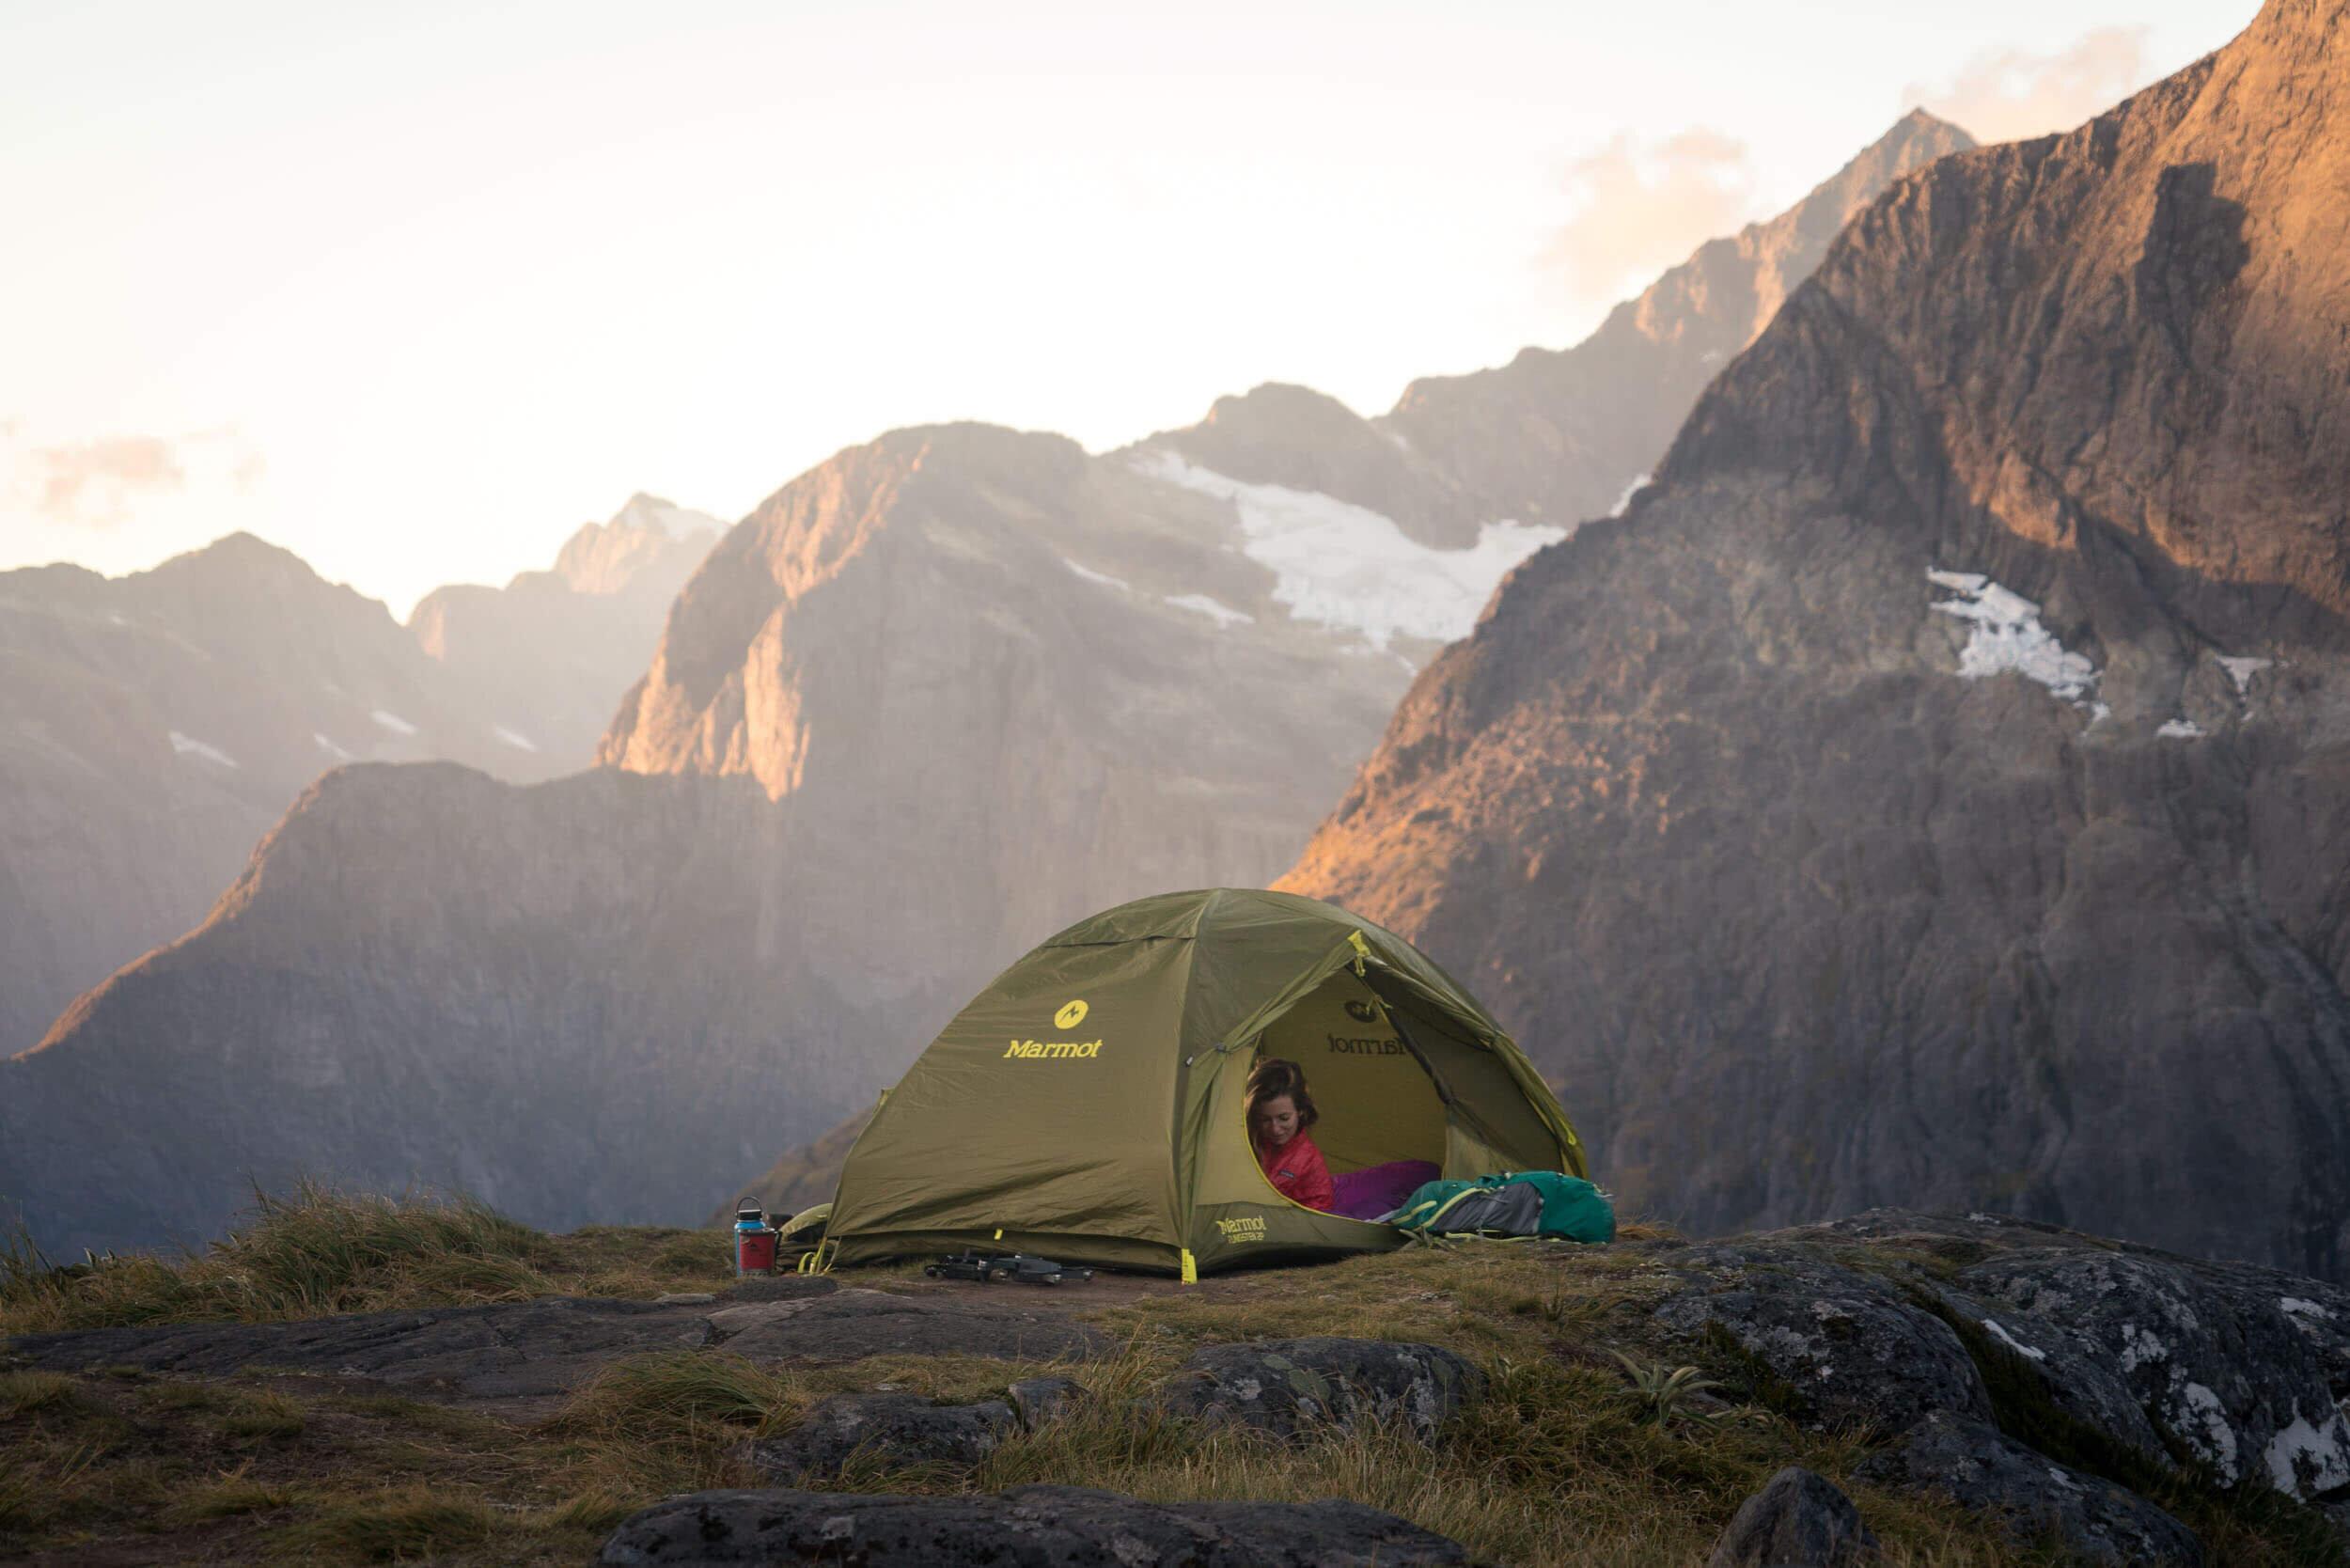 Camping at the top of Gertrude Saddle.